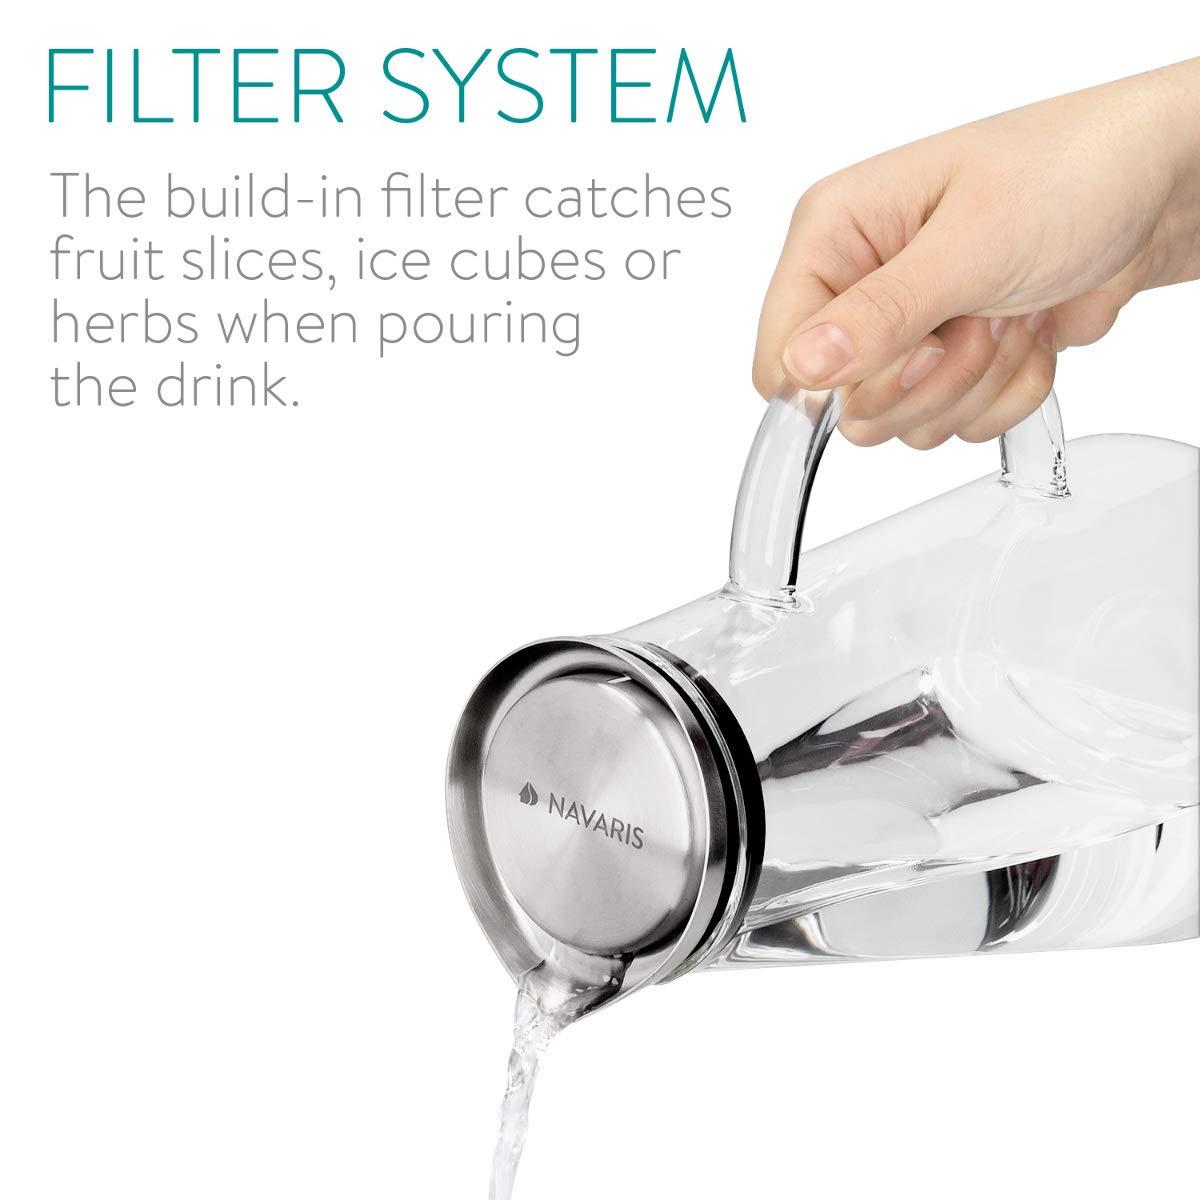 Decantador con Tapa para Todo Tipo de Bebidas Navaris Jarra de Cristal de 1.6L para Agua Botella de Vidrio con Filtro de Aluminio